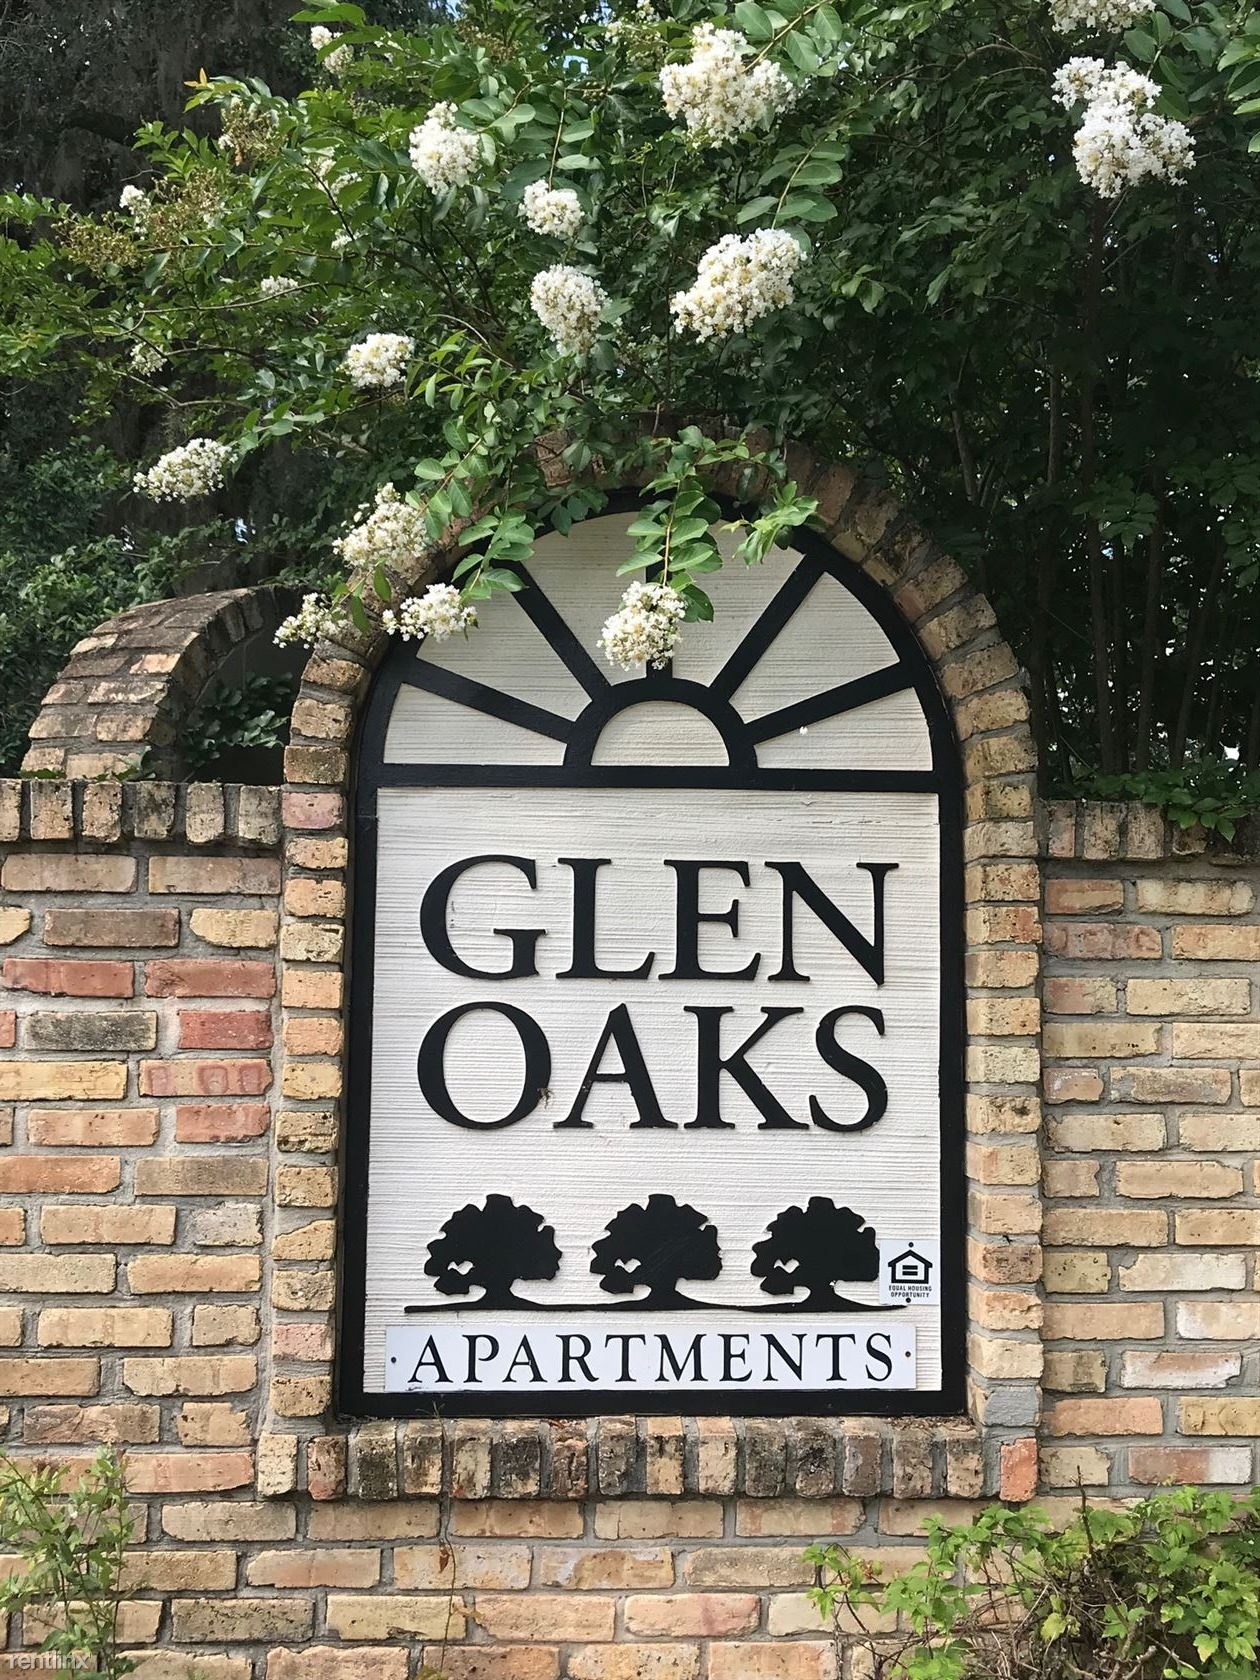 Glen Oaks Apartments